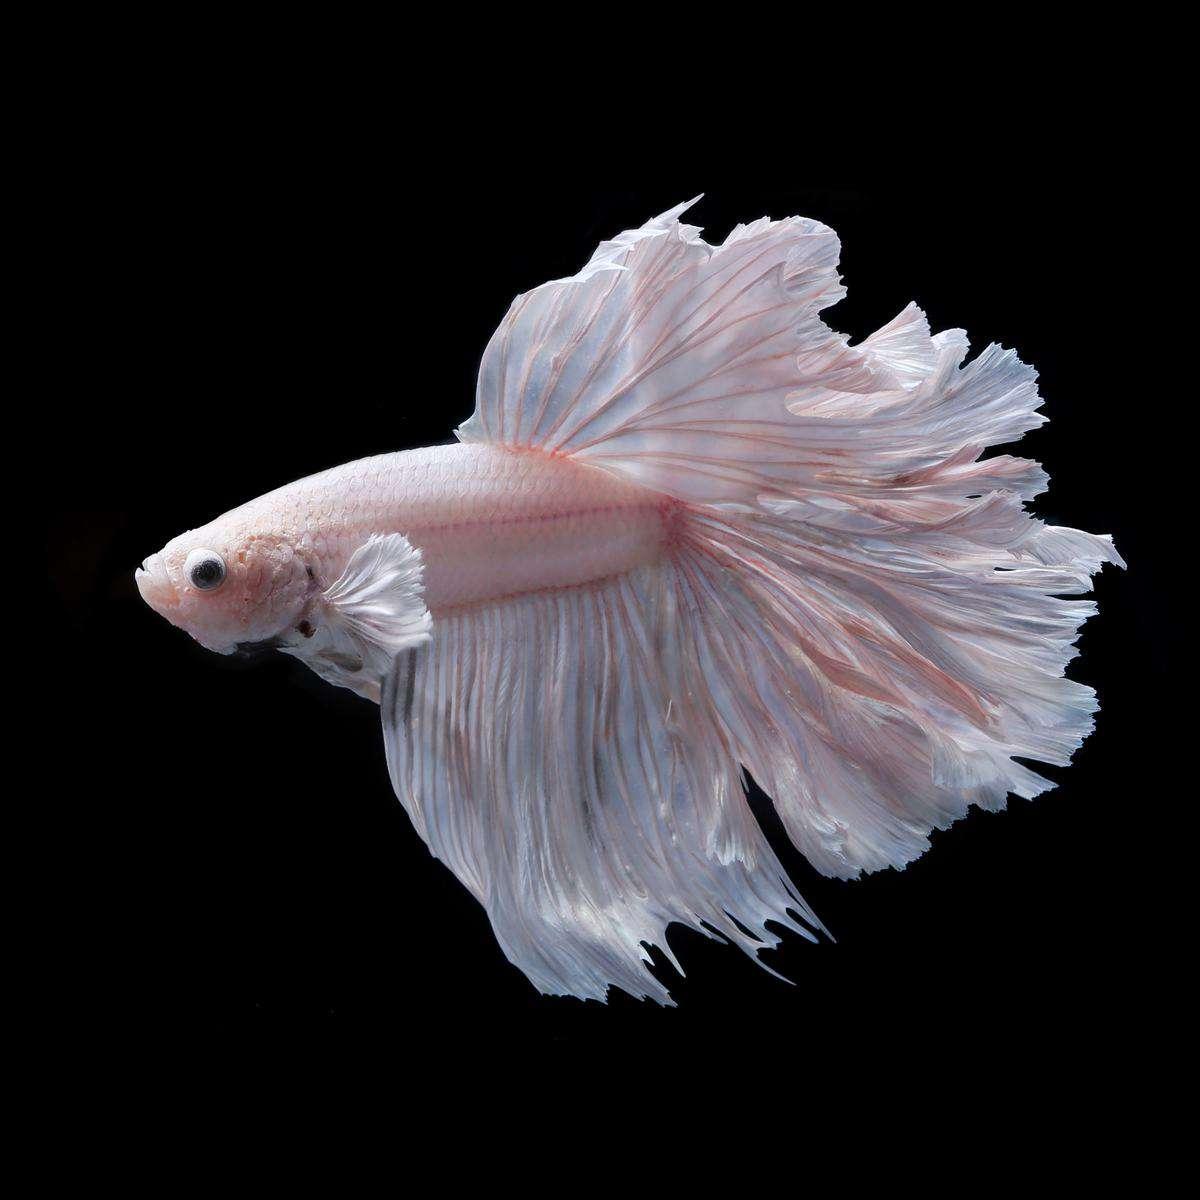 albino betta